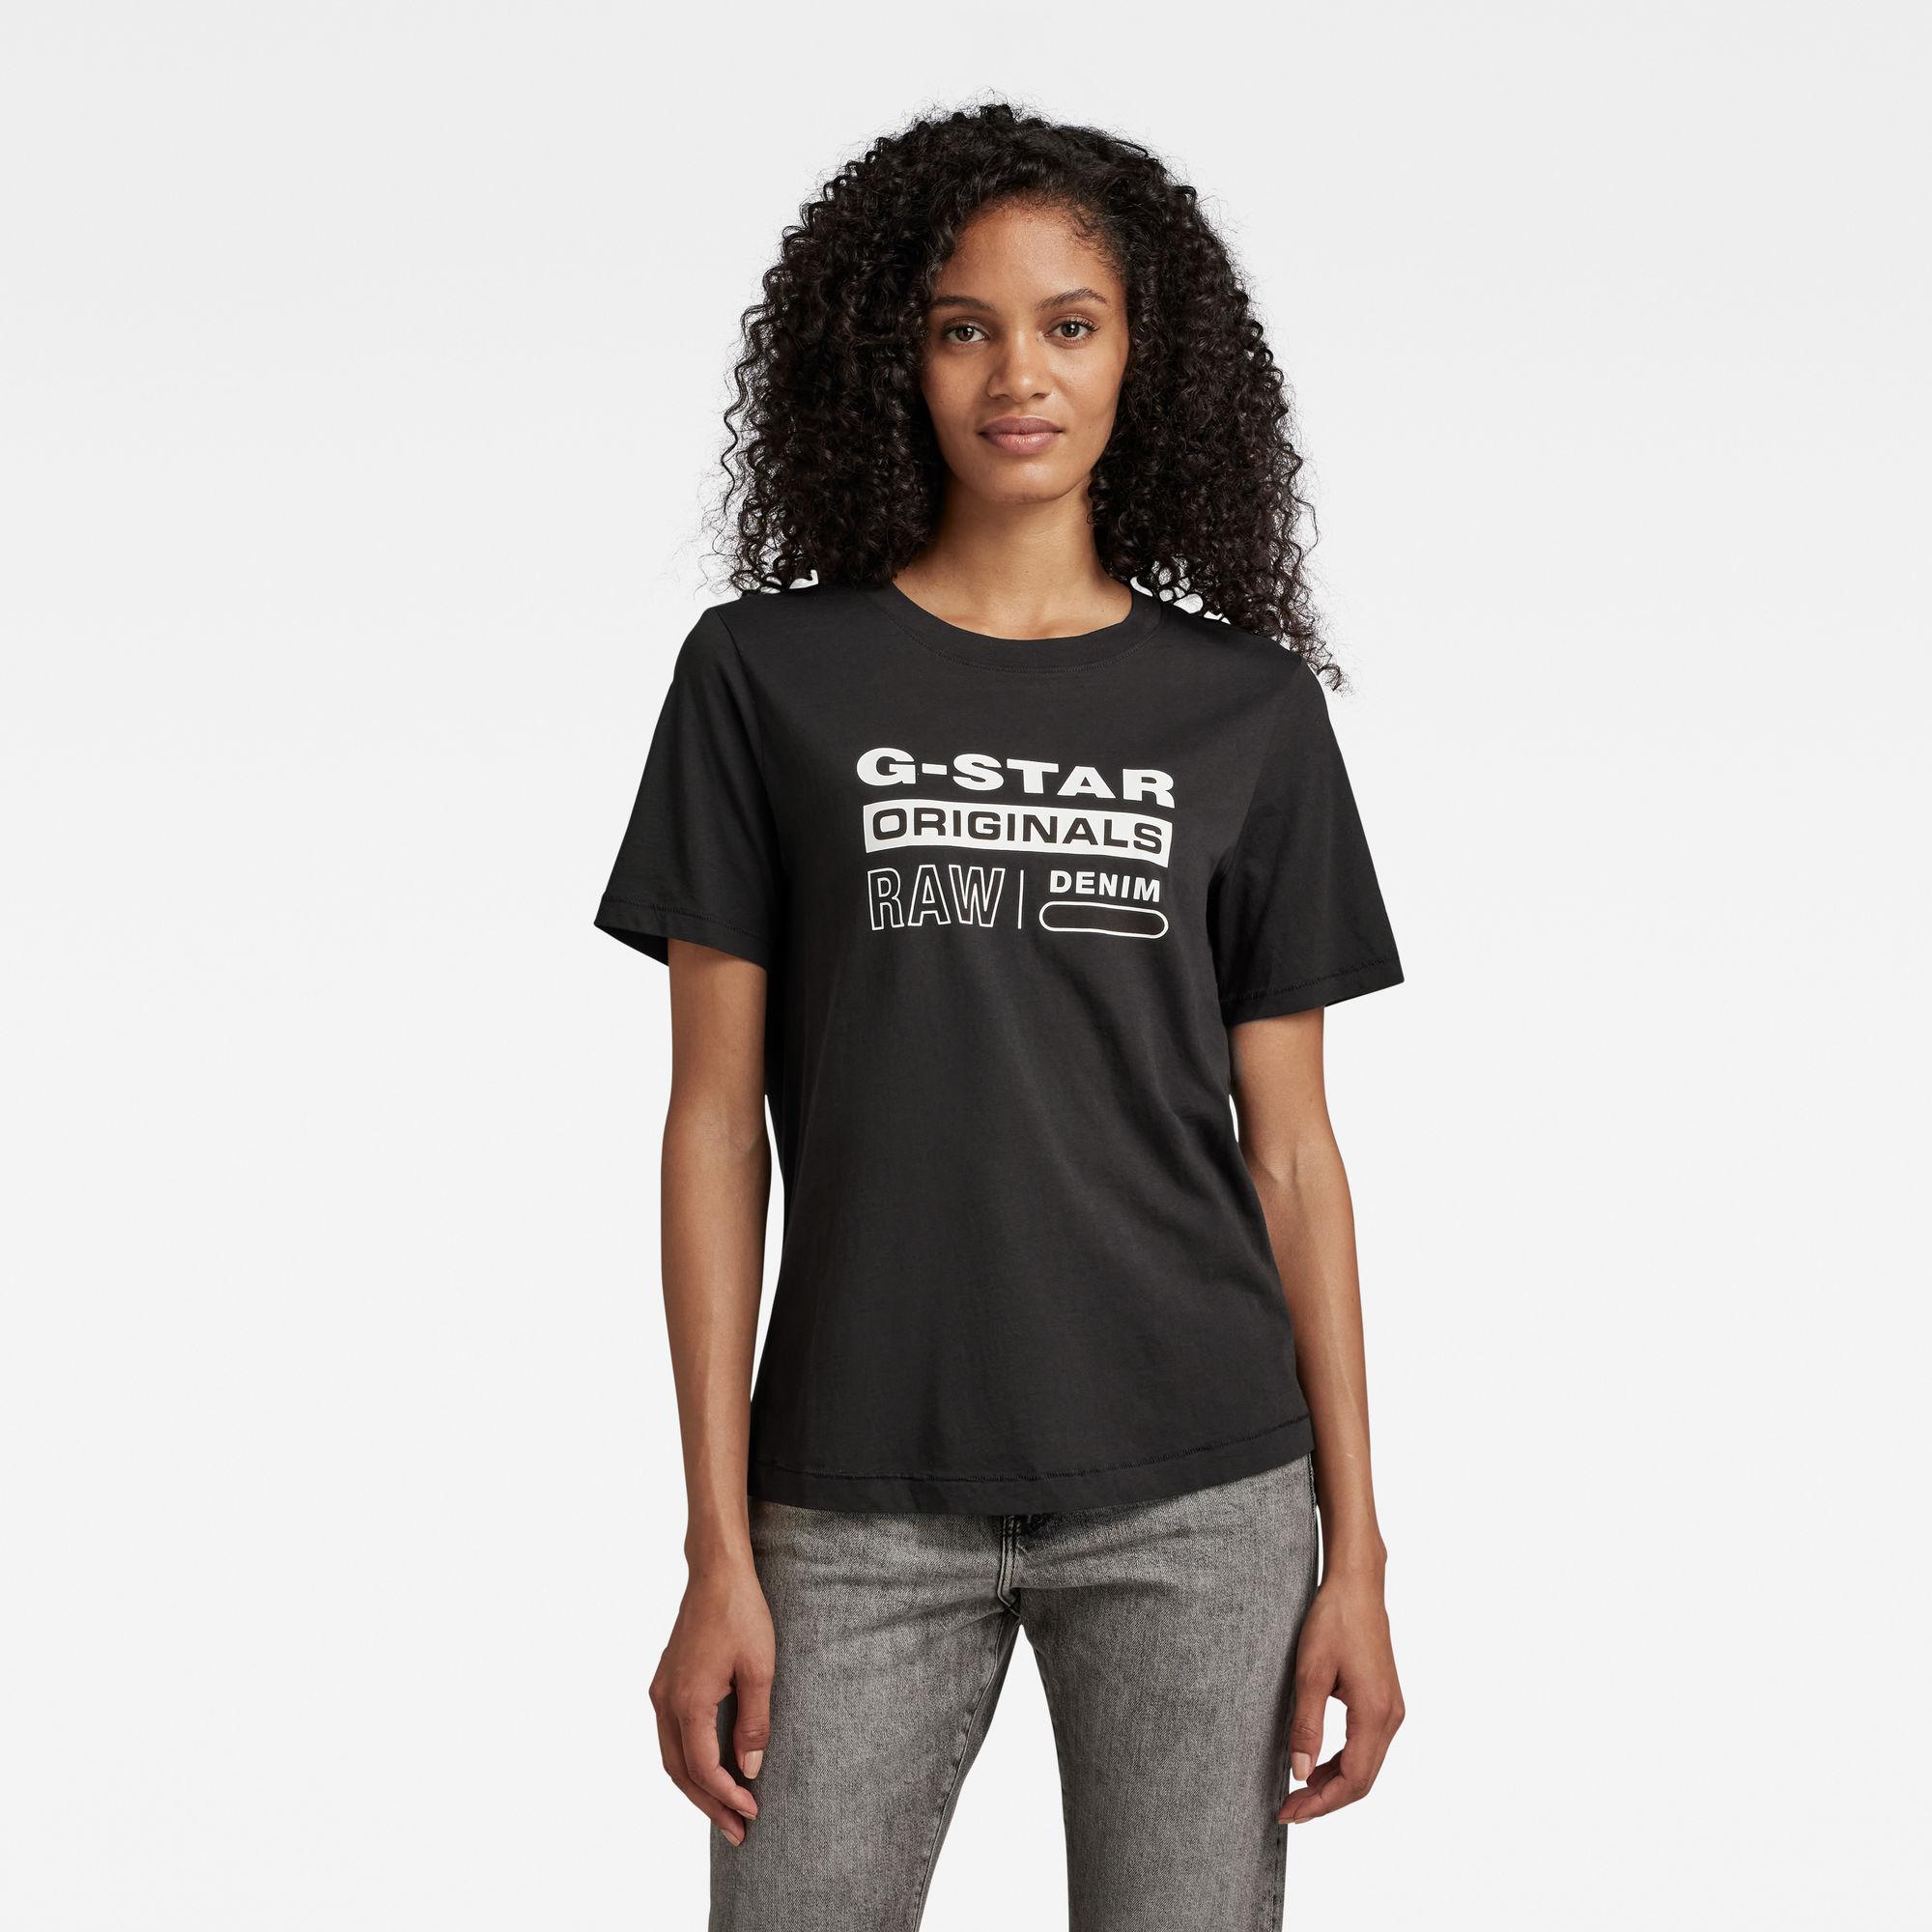 G-Star RAW Dames Originals Label Regular Fit Tee Zwart